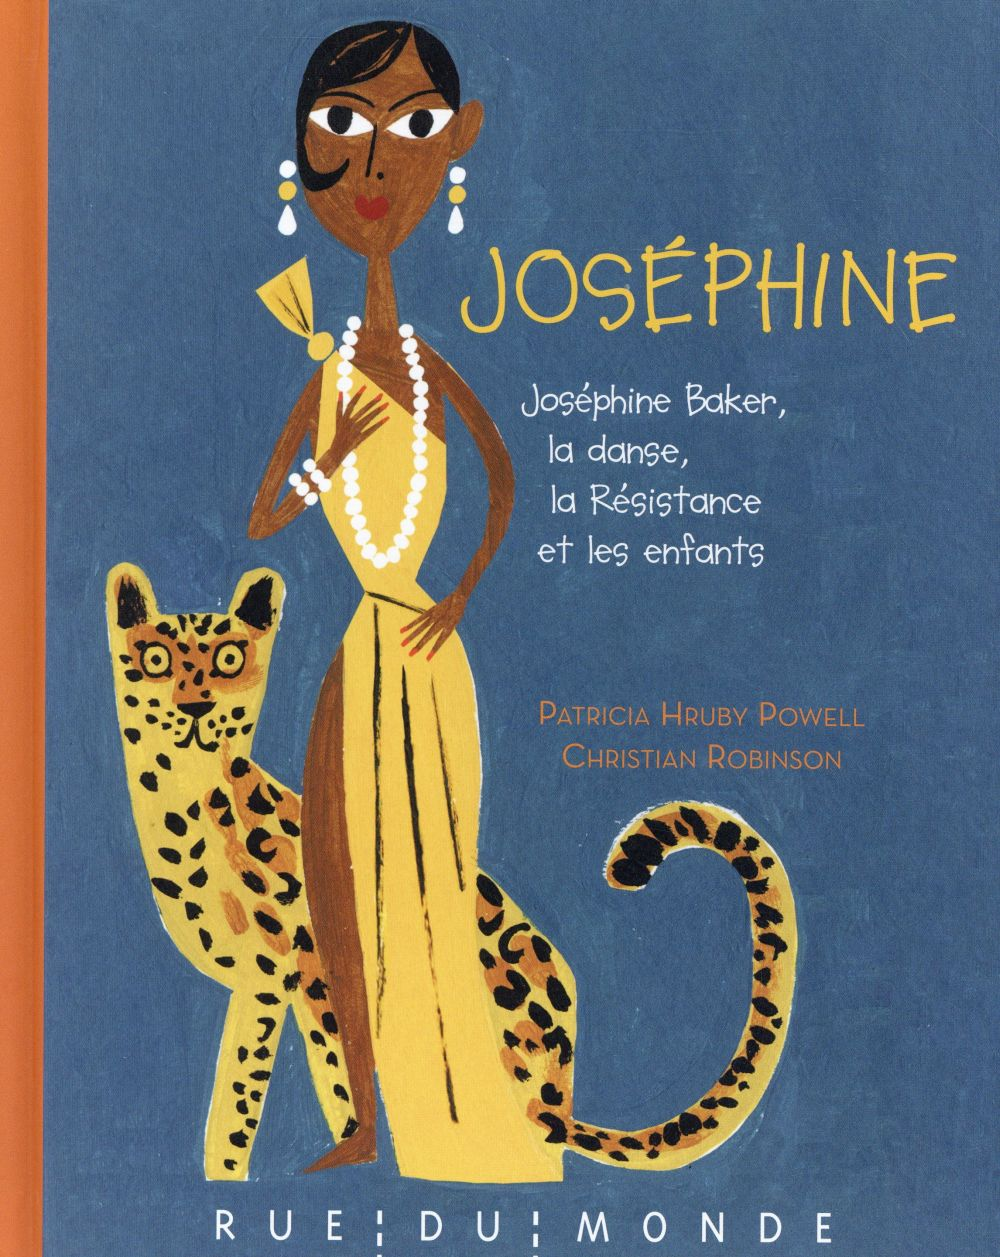 Robinson Christian - JOSEPHINE - JOSEPHINE BAKER, LA DANSE, LA RESISTANCE...